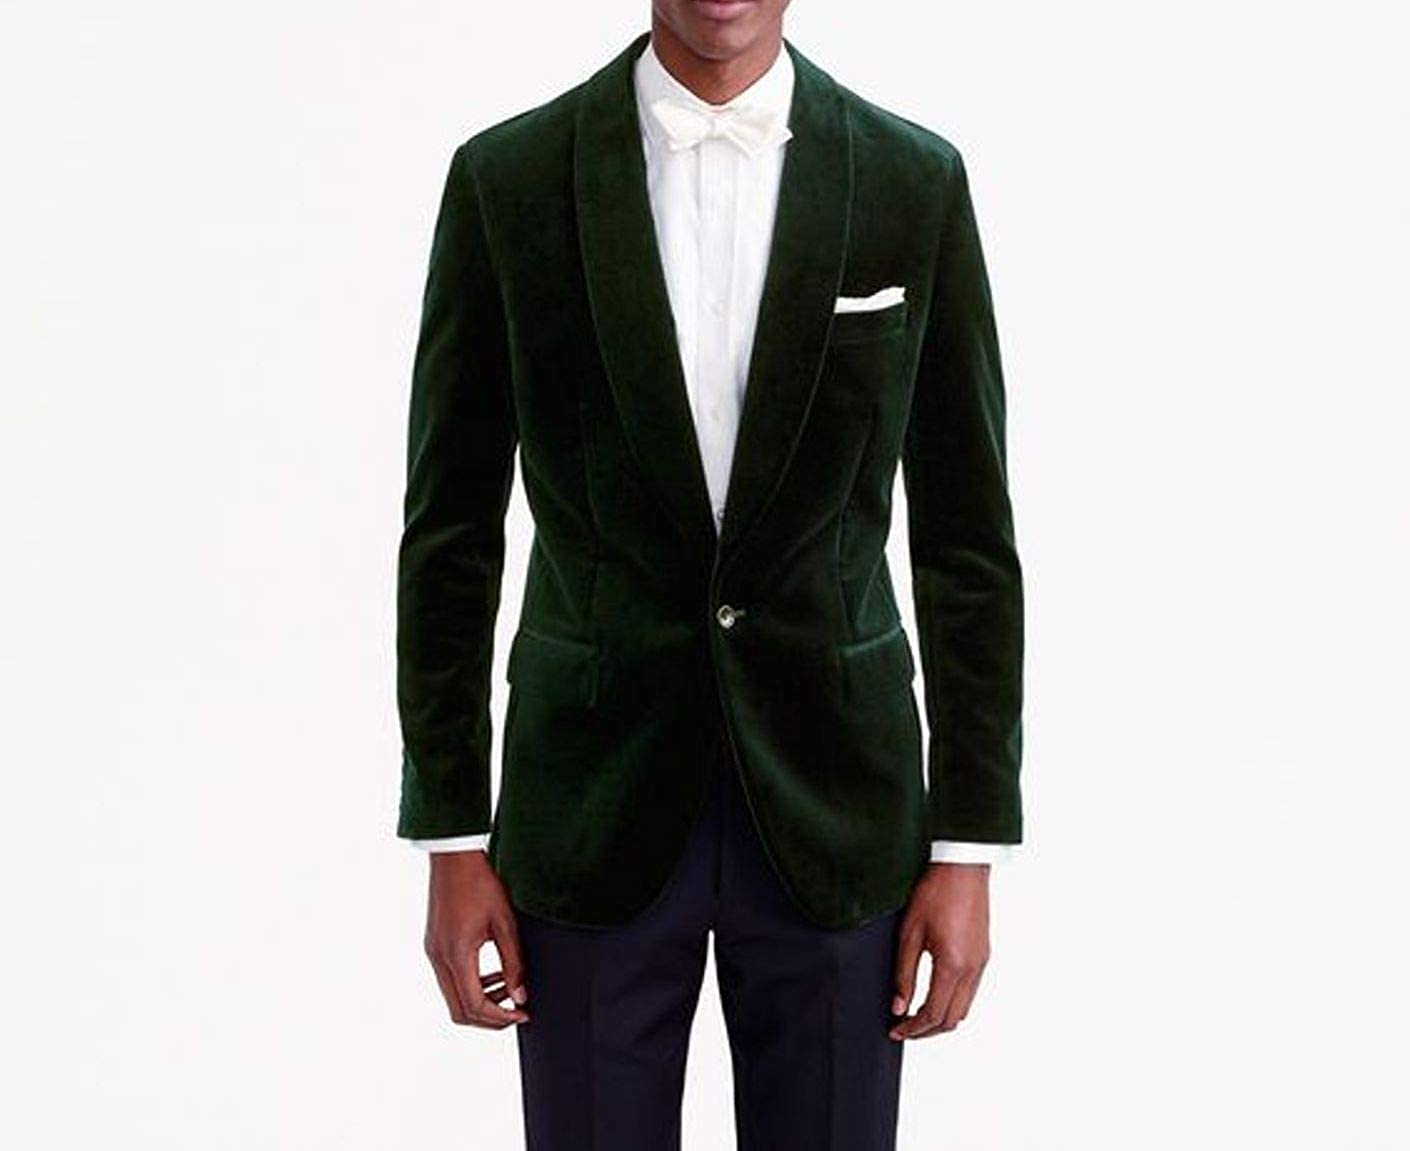 Pinkcityart Mens Smoking Jacket Green Velvet Blazer Hosting Evening Dinner Party Wear Coat Blazers